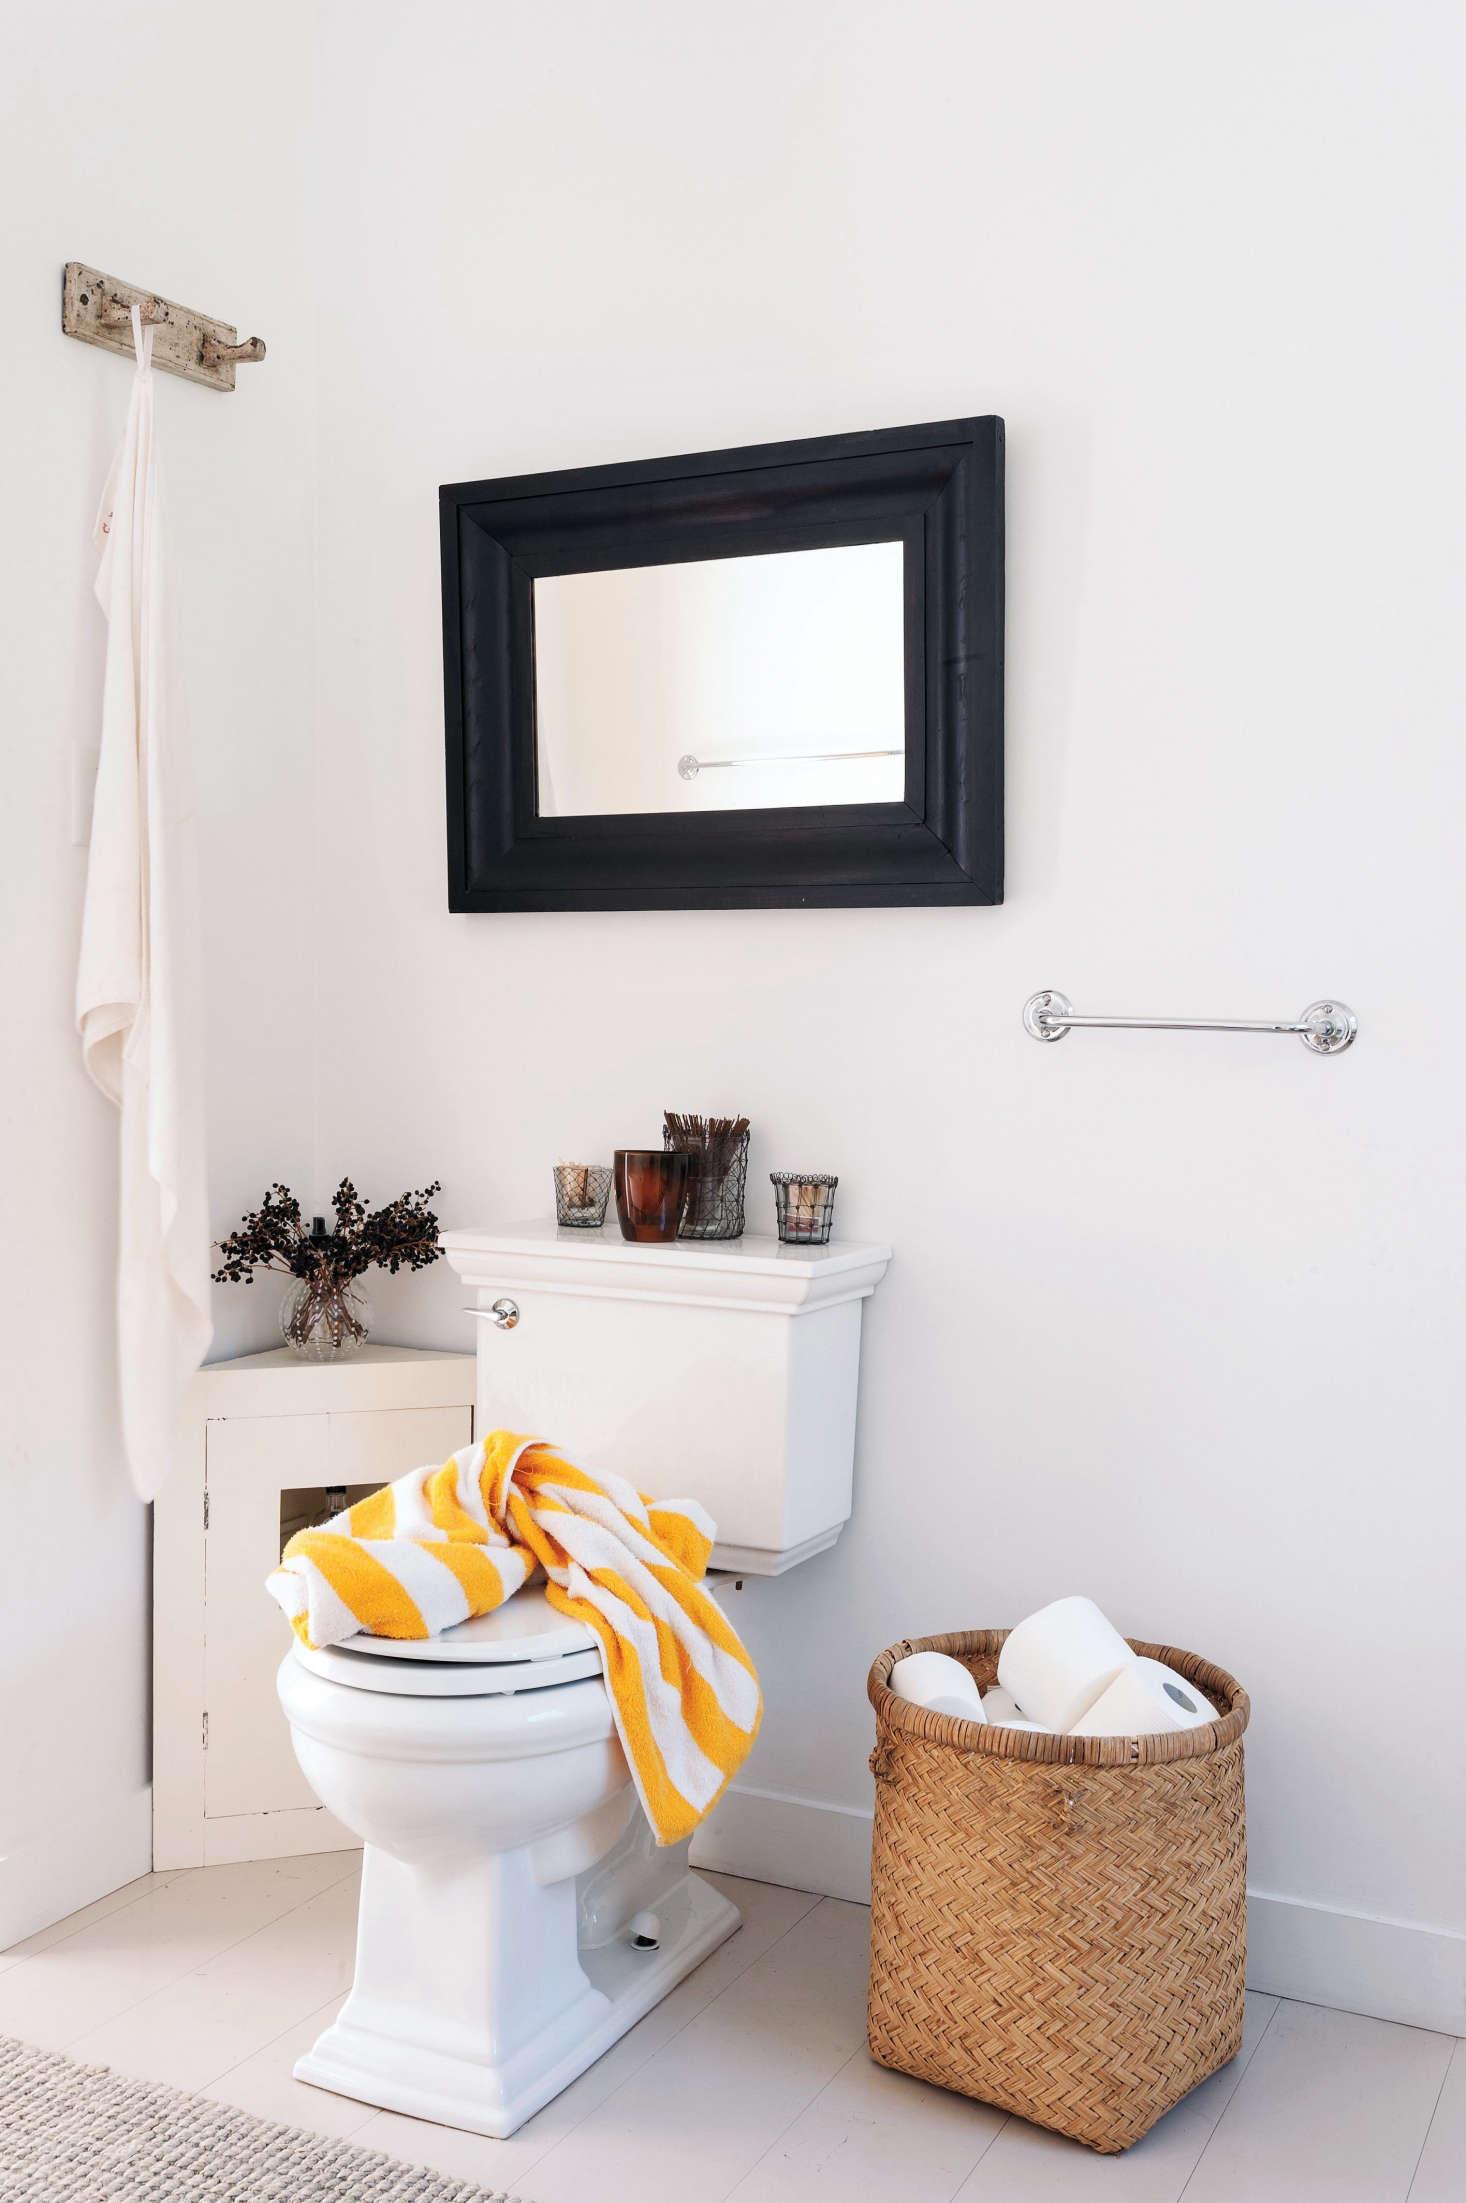 5 Quick Fixes Inventive Toilet Paper Storage Remodelista